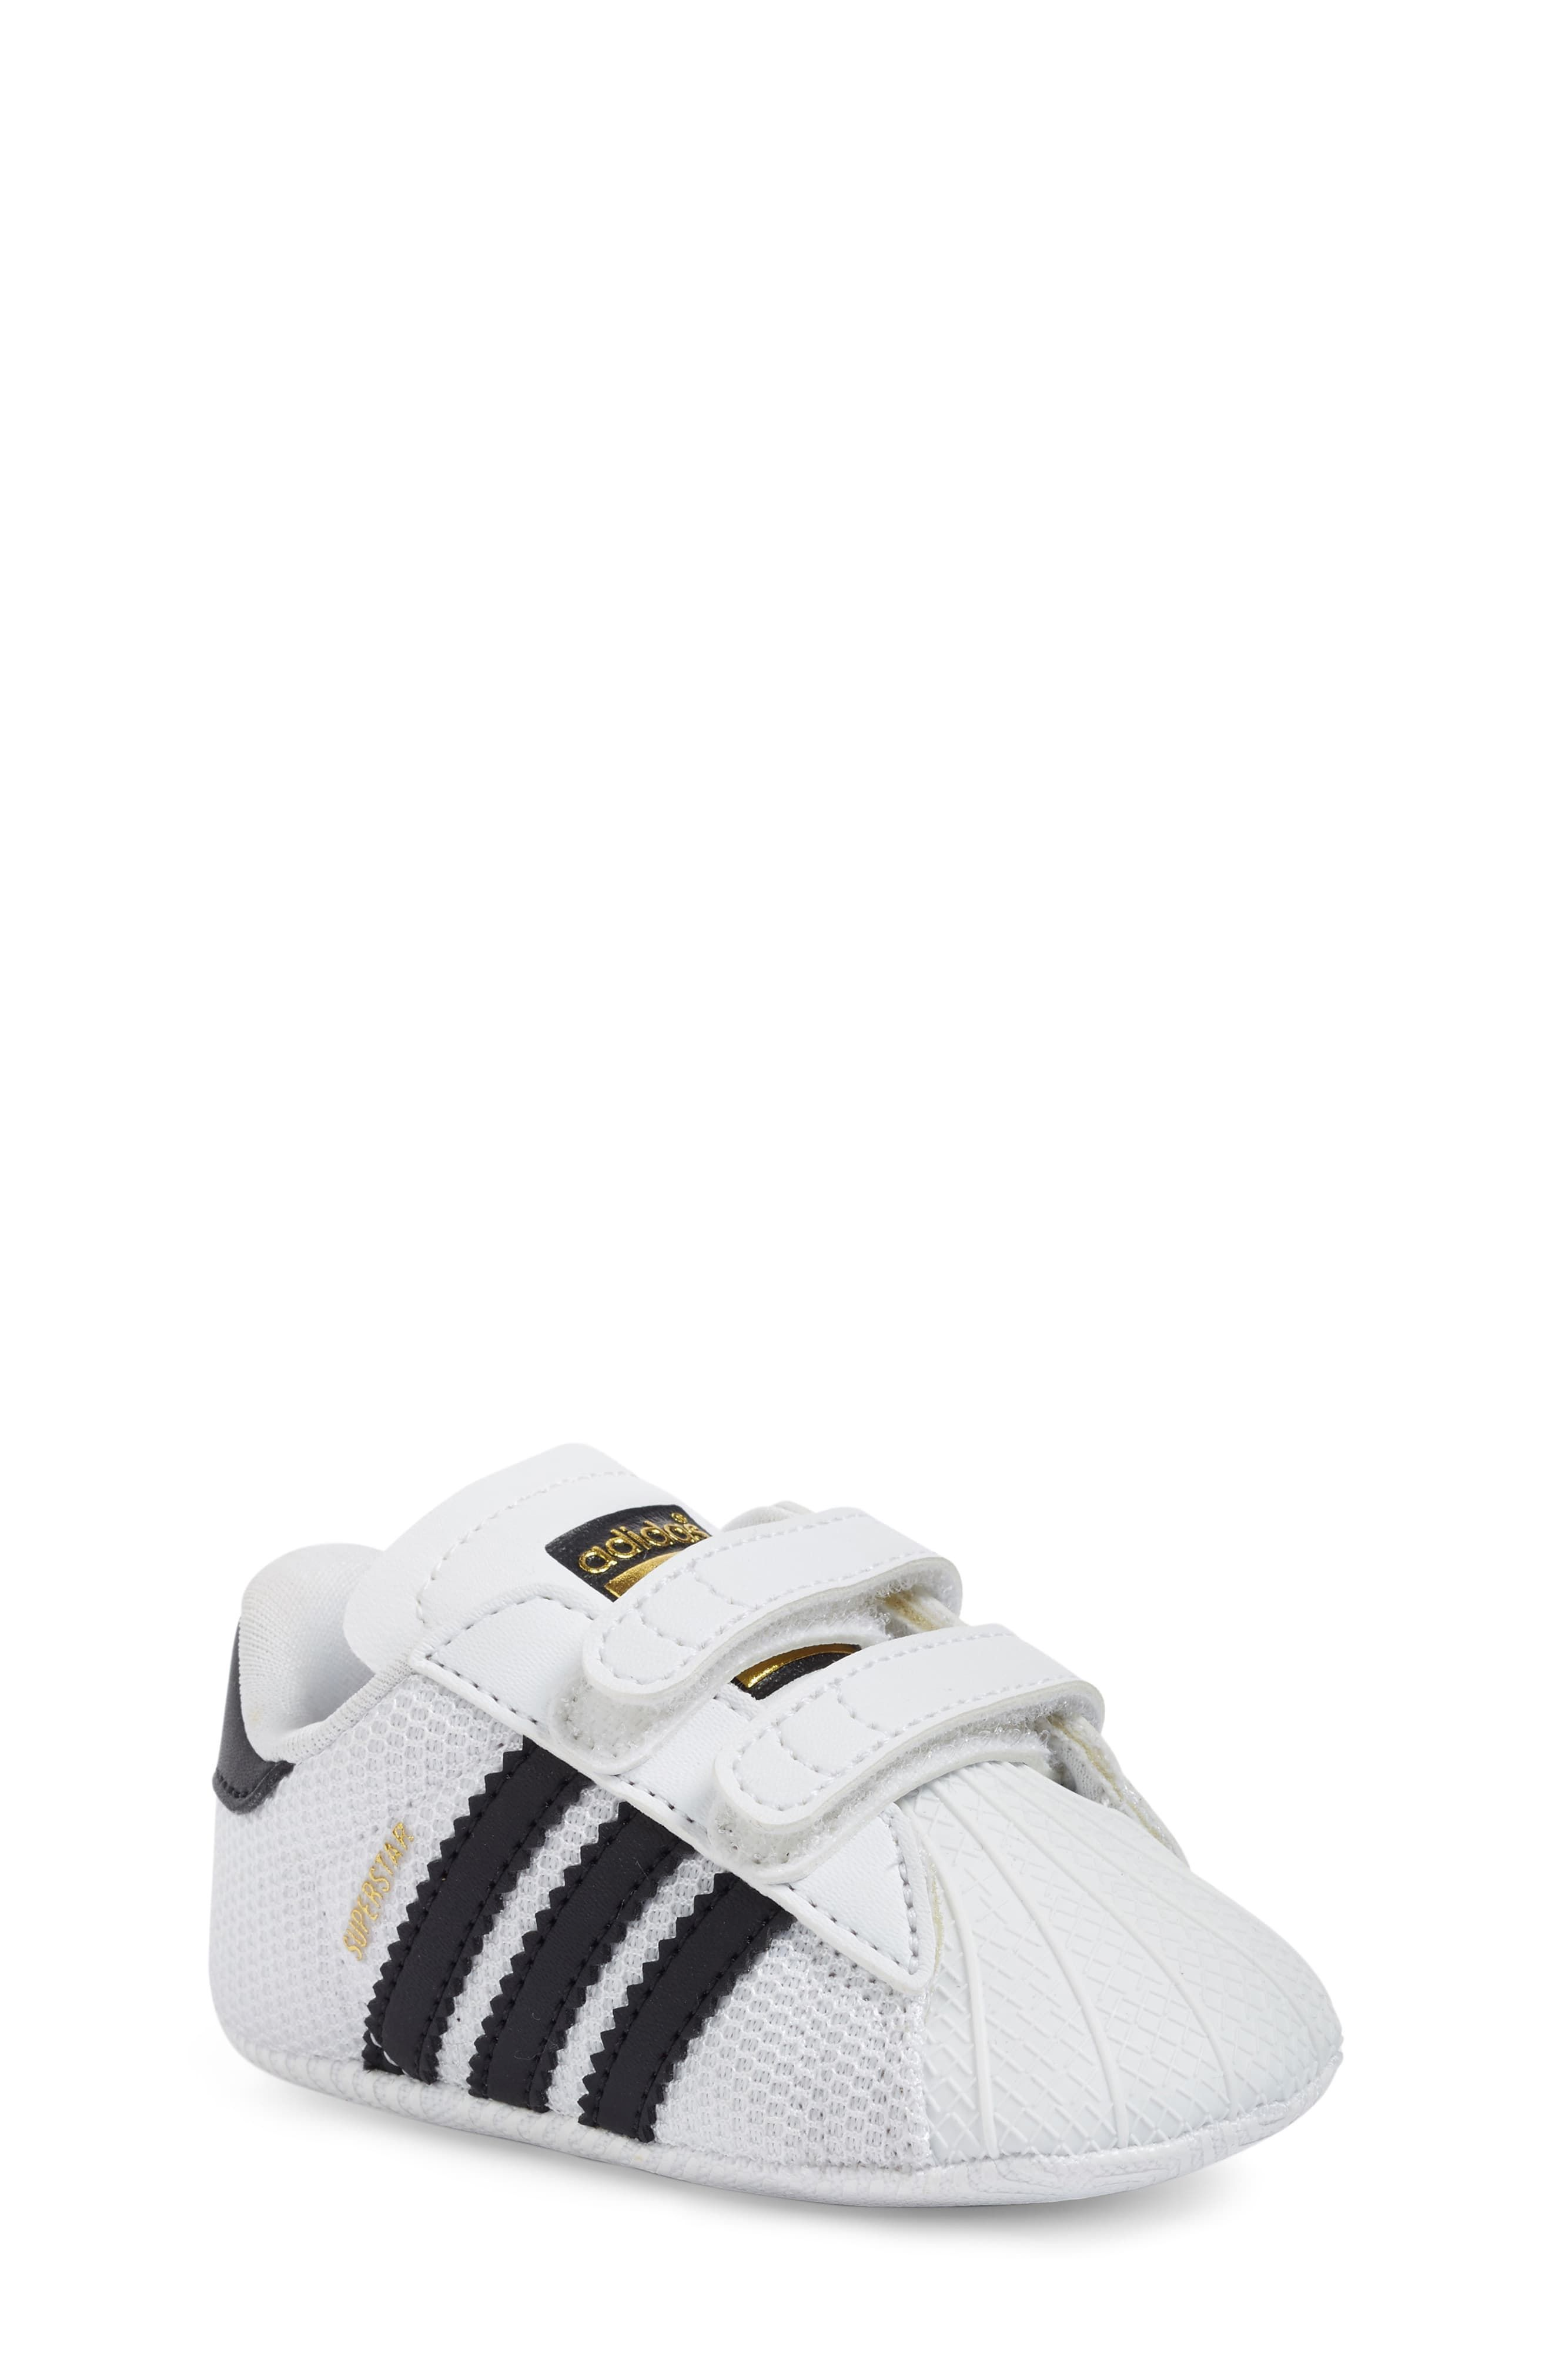 adidas superstar toddler size 5